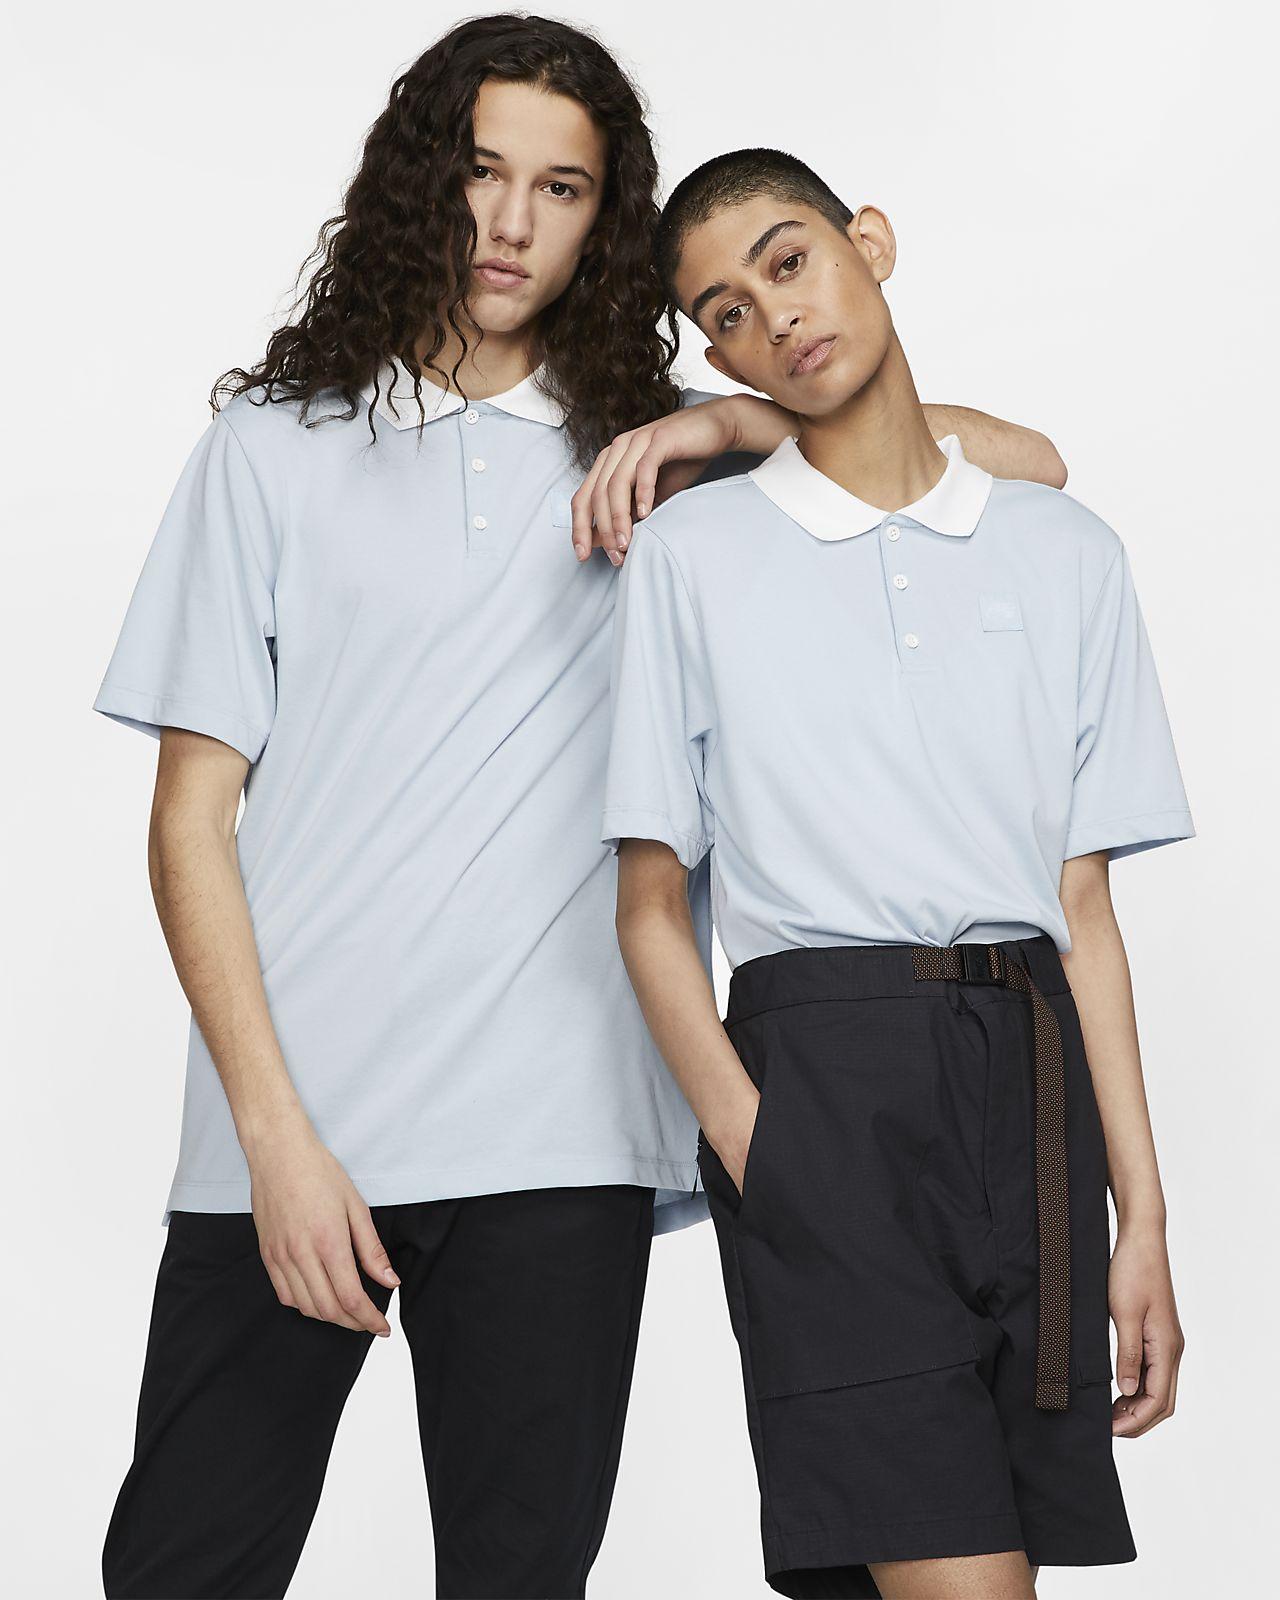 Nike SB Dri-FIT Kurzarm-Skateboard-Poloshirt